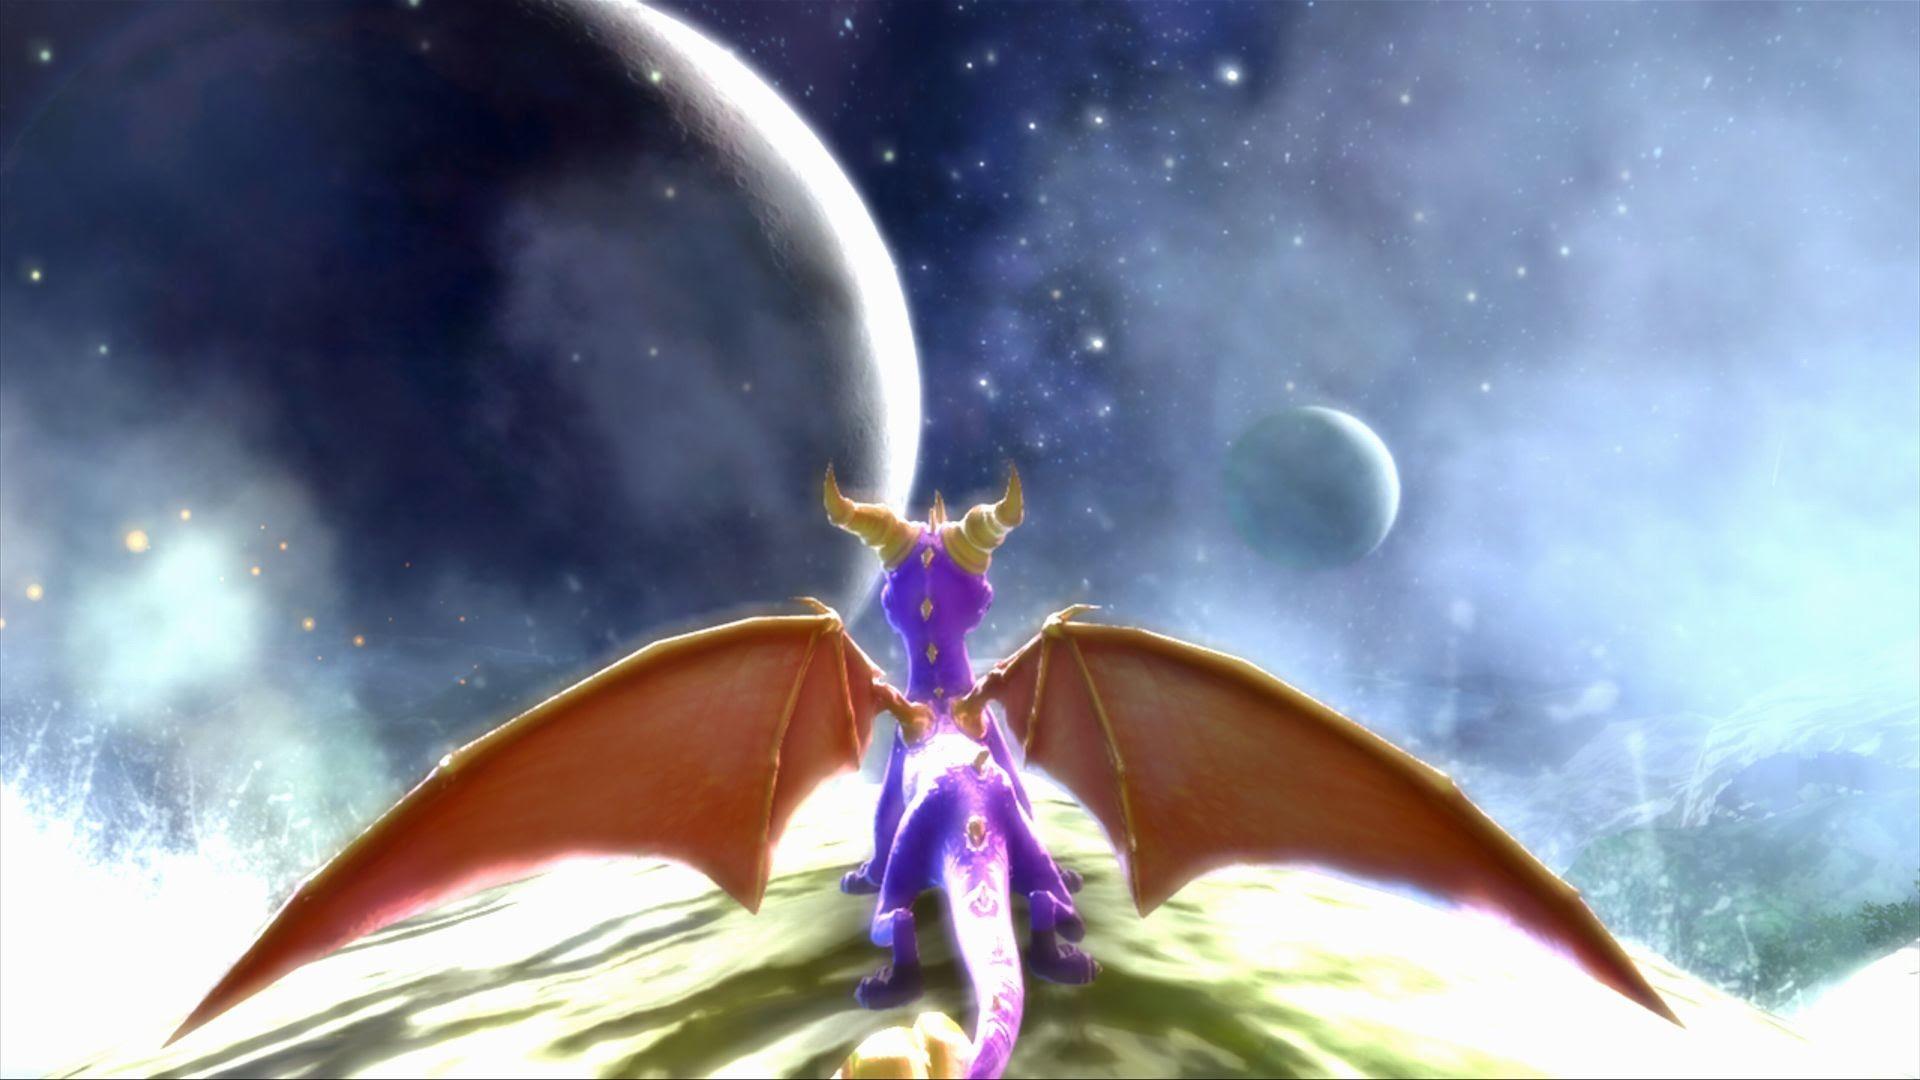 Spyro The Dragon Wallpaper 68 Images